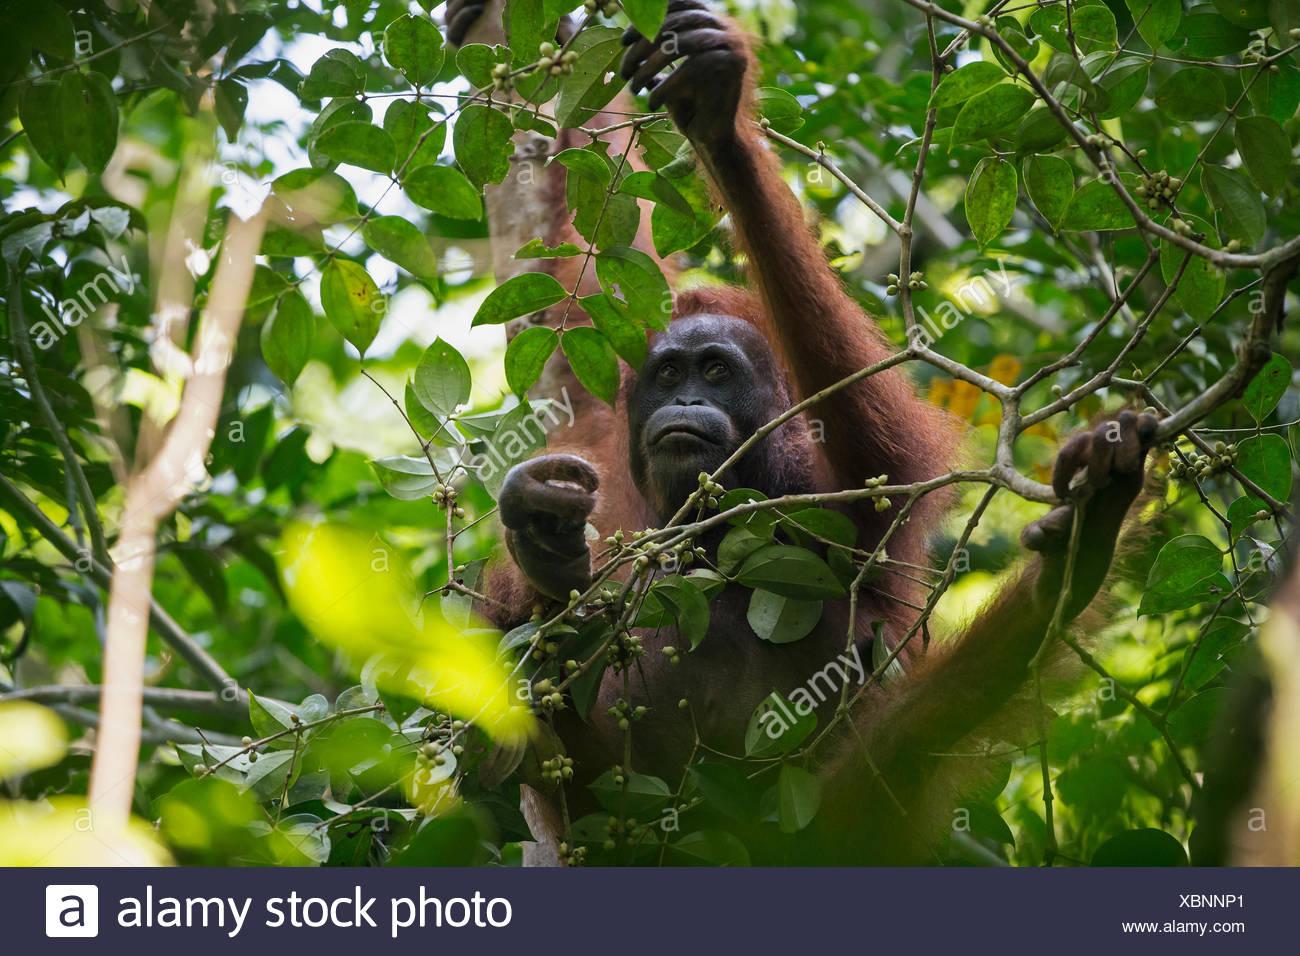 A Bornean orangutan, Pongo pygmaeus wurmbii, tends to her severely injured foot. - Stock Image